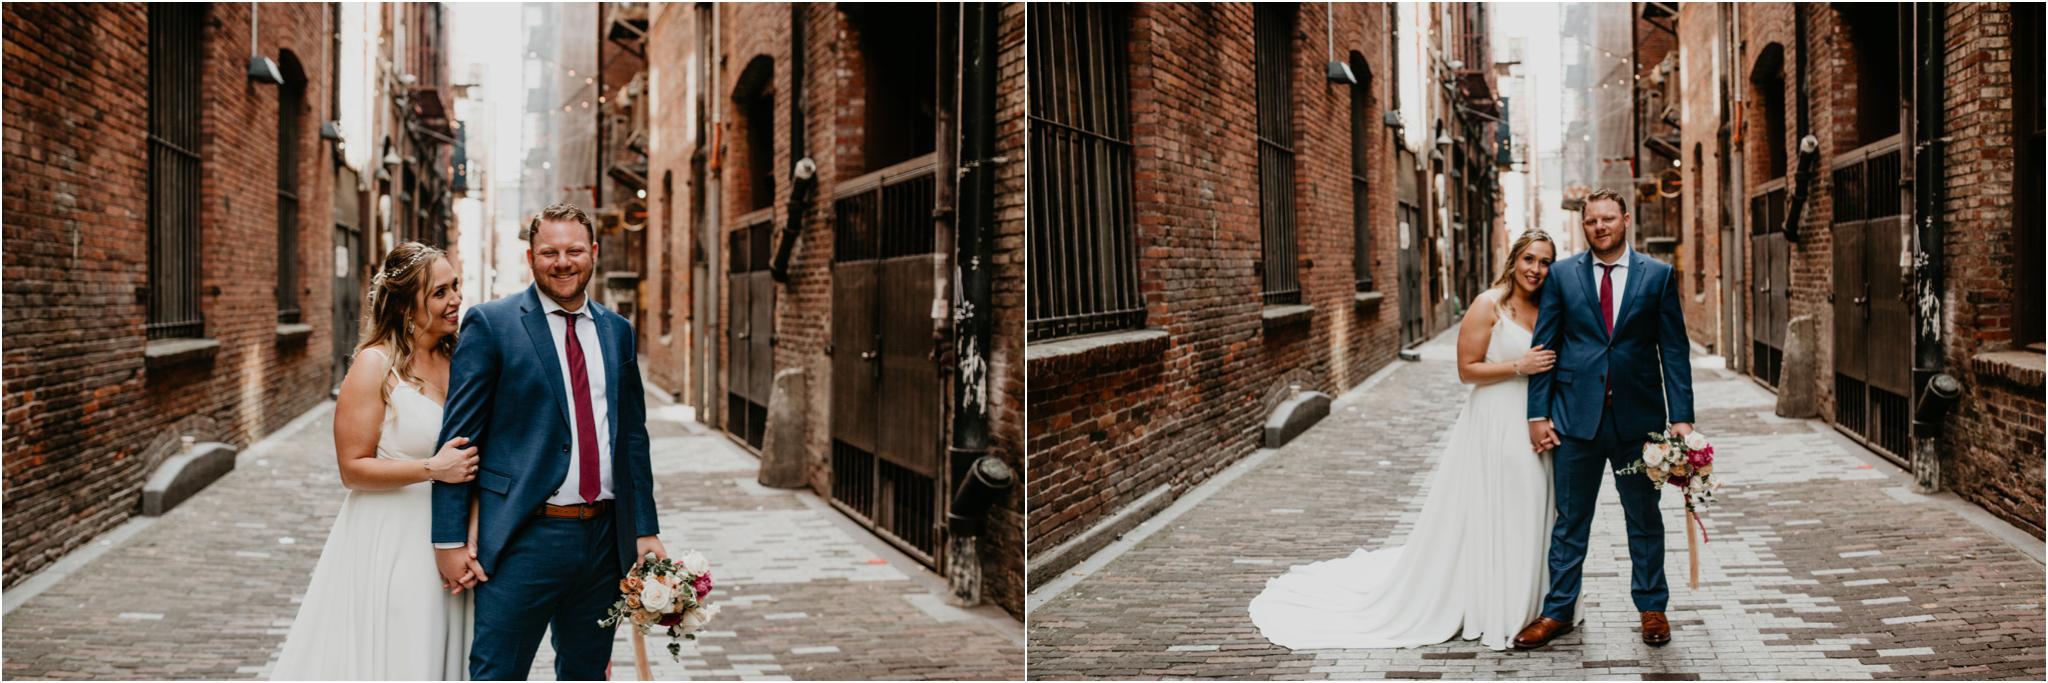 laura-and-matt-metropolist-urban-seattle-wedding-photographer-071.jpg